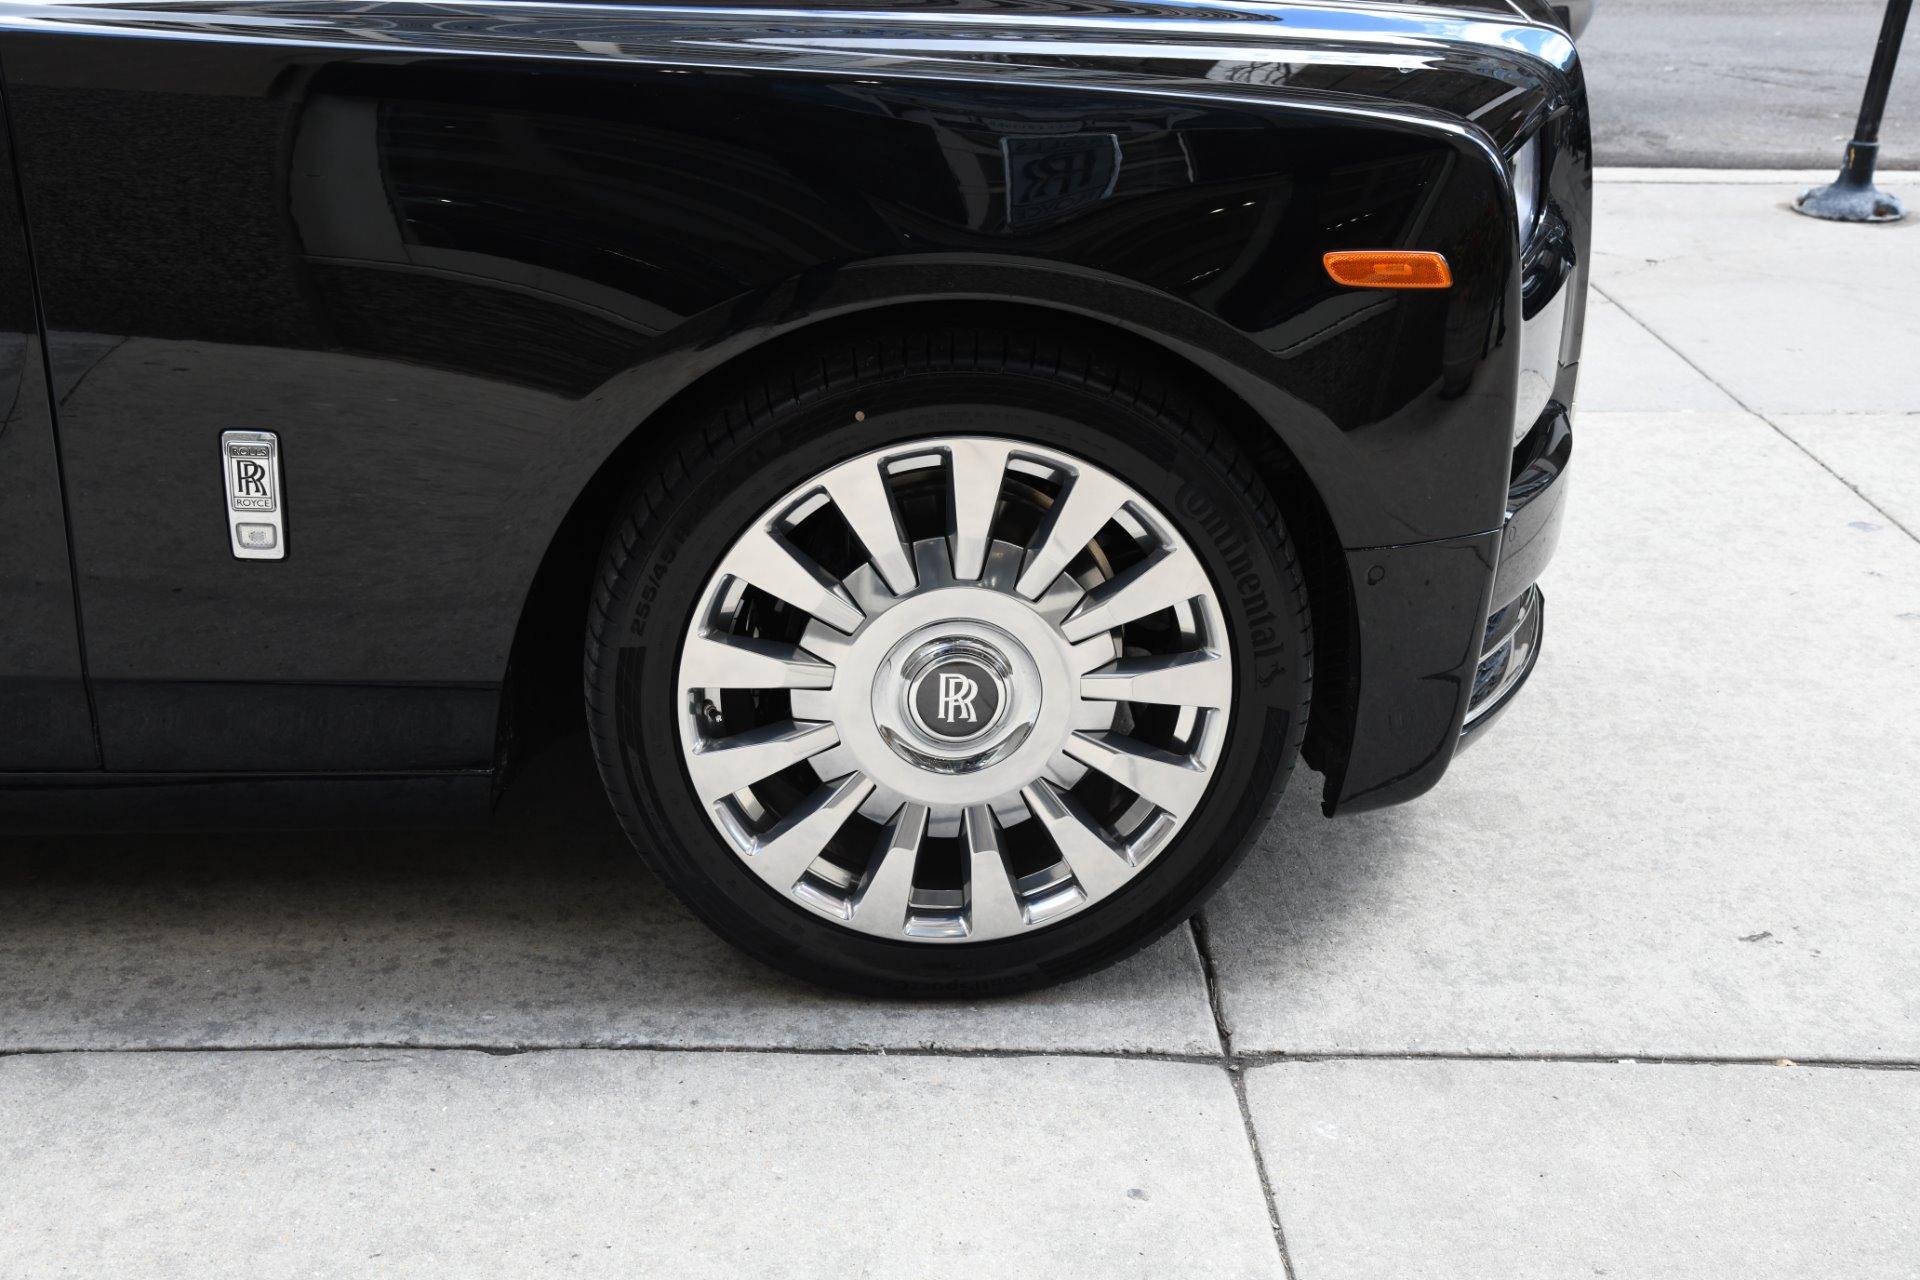 New 2018 Rolls-Royce Phantom ***TAKING ORDERS NOW*** | Chicago, IL